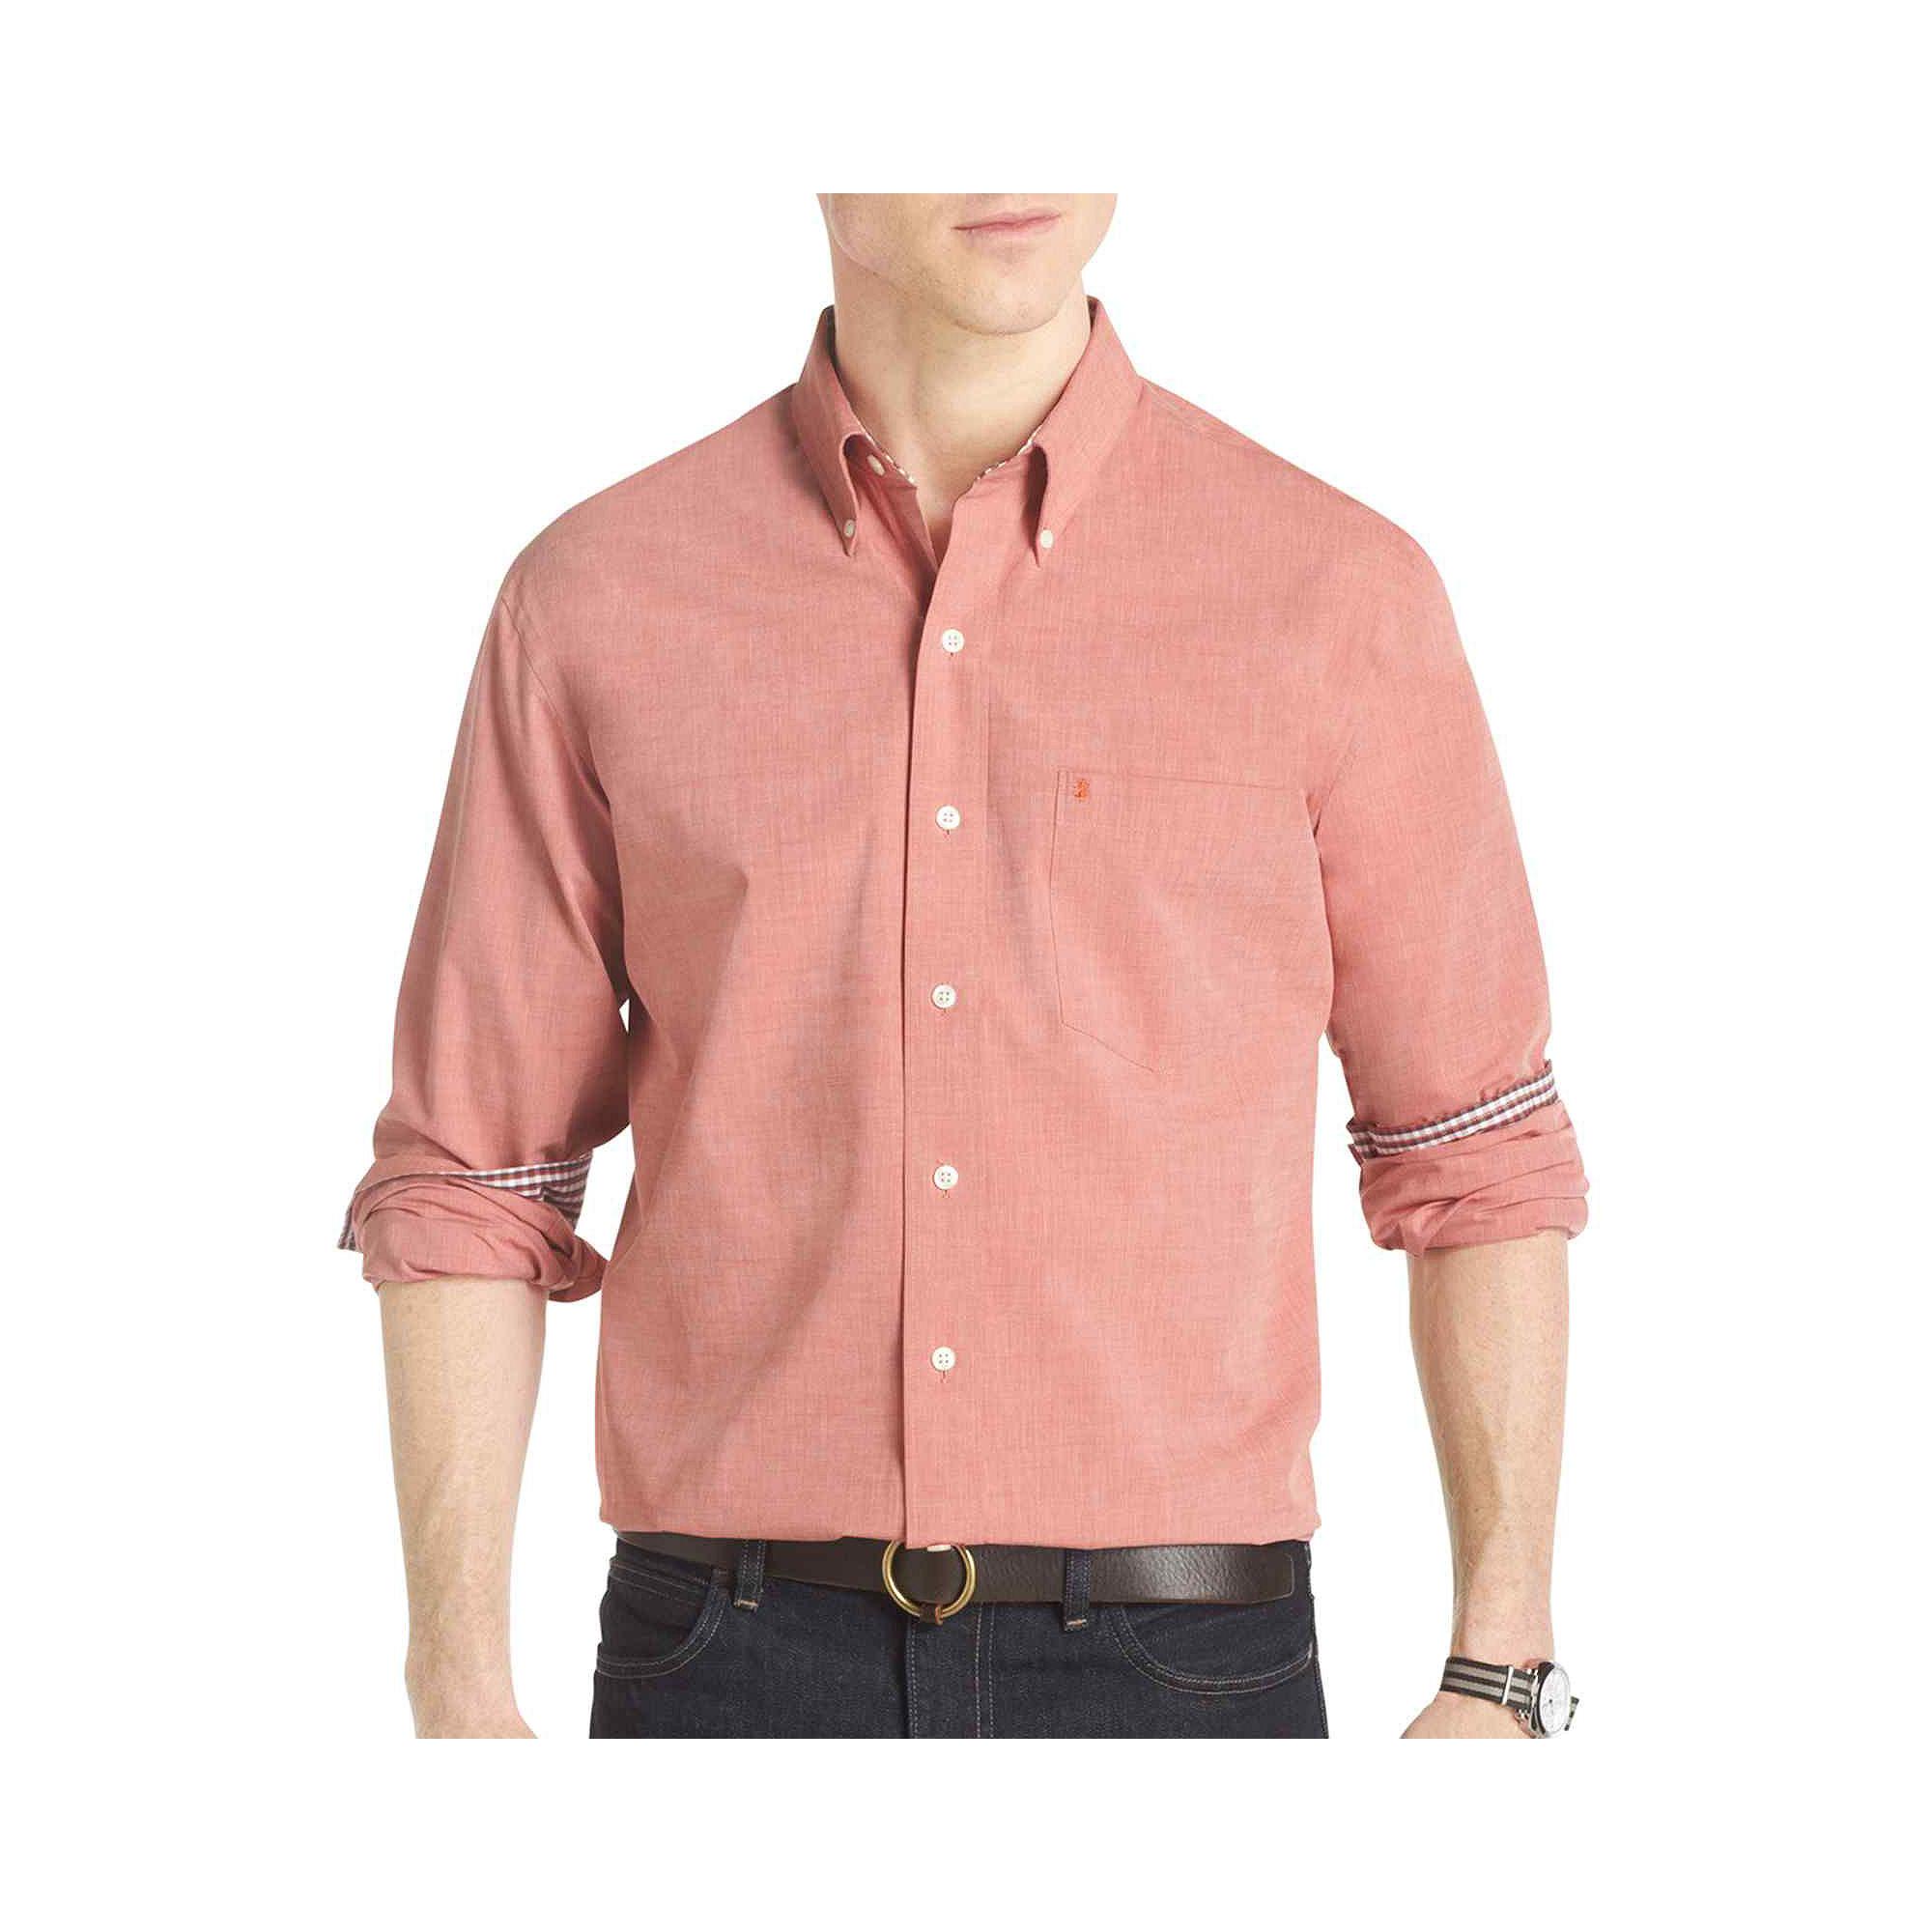 Upc 014056664246 Izod Long Sleeve Poplin Shirt Upcitemdb